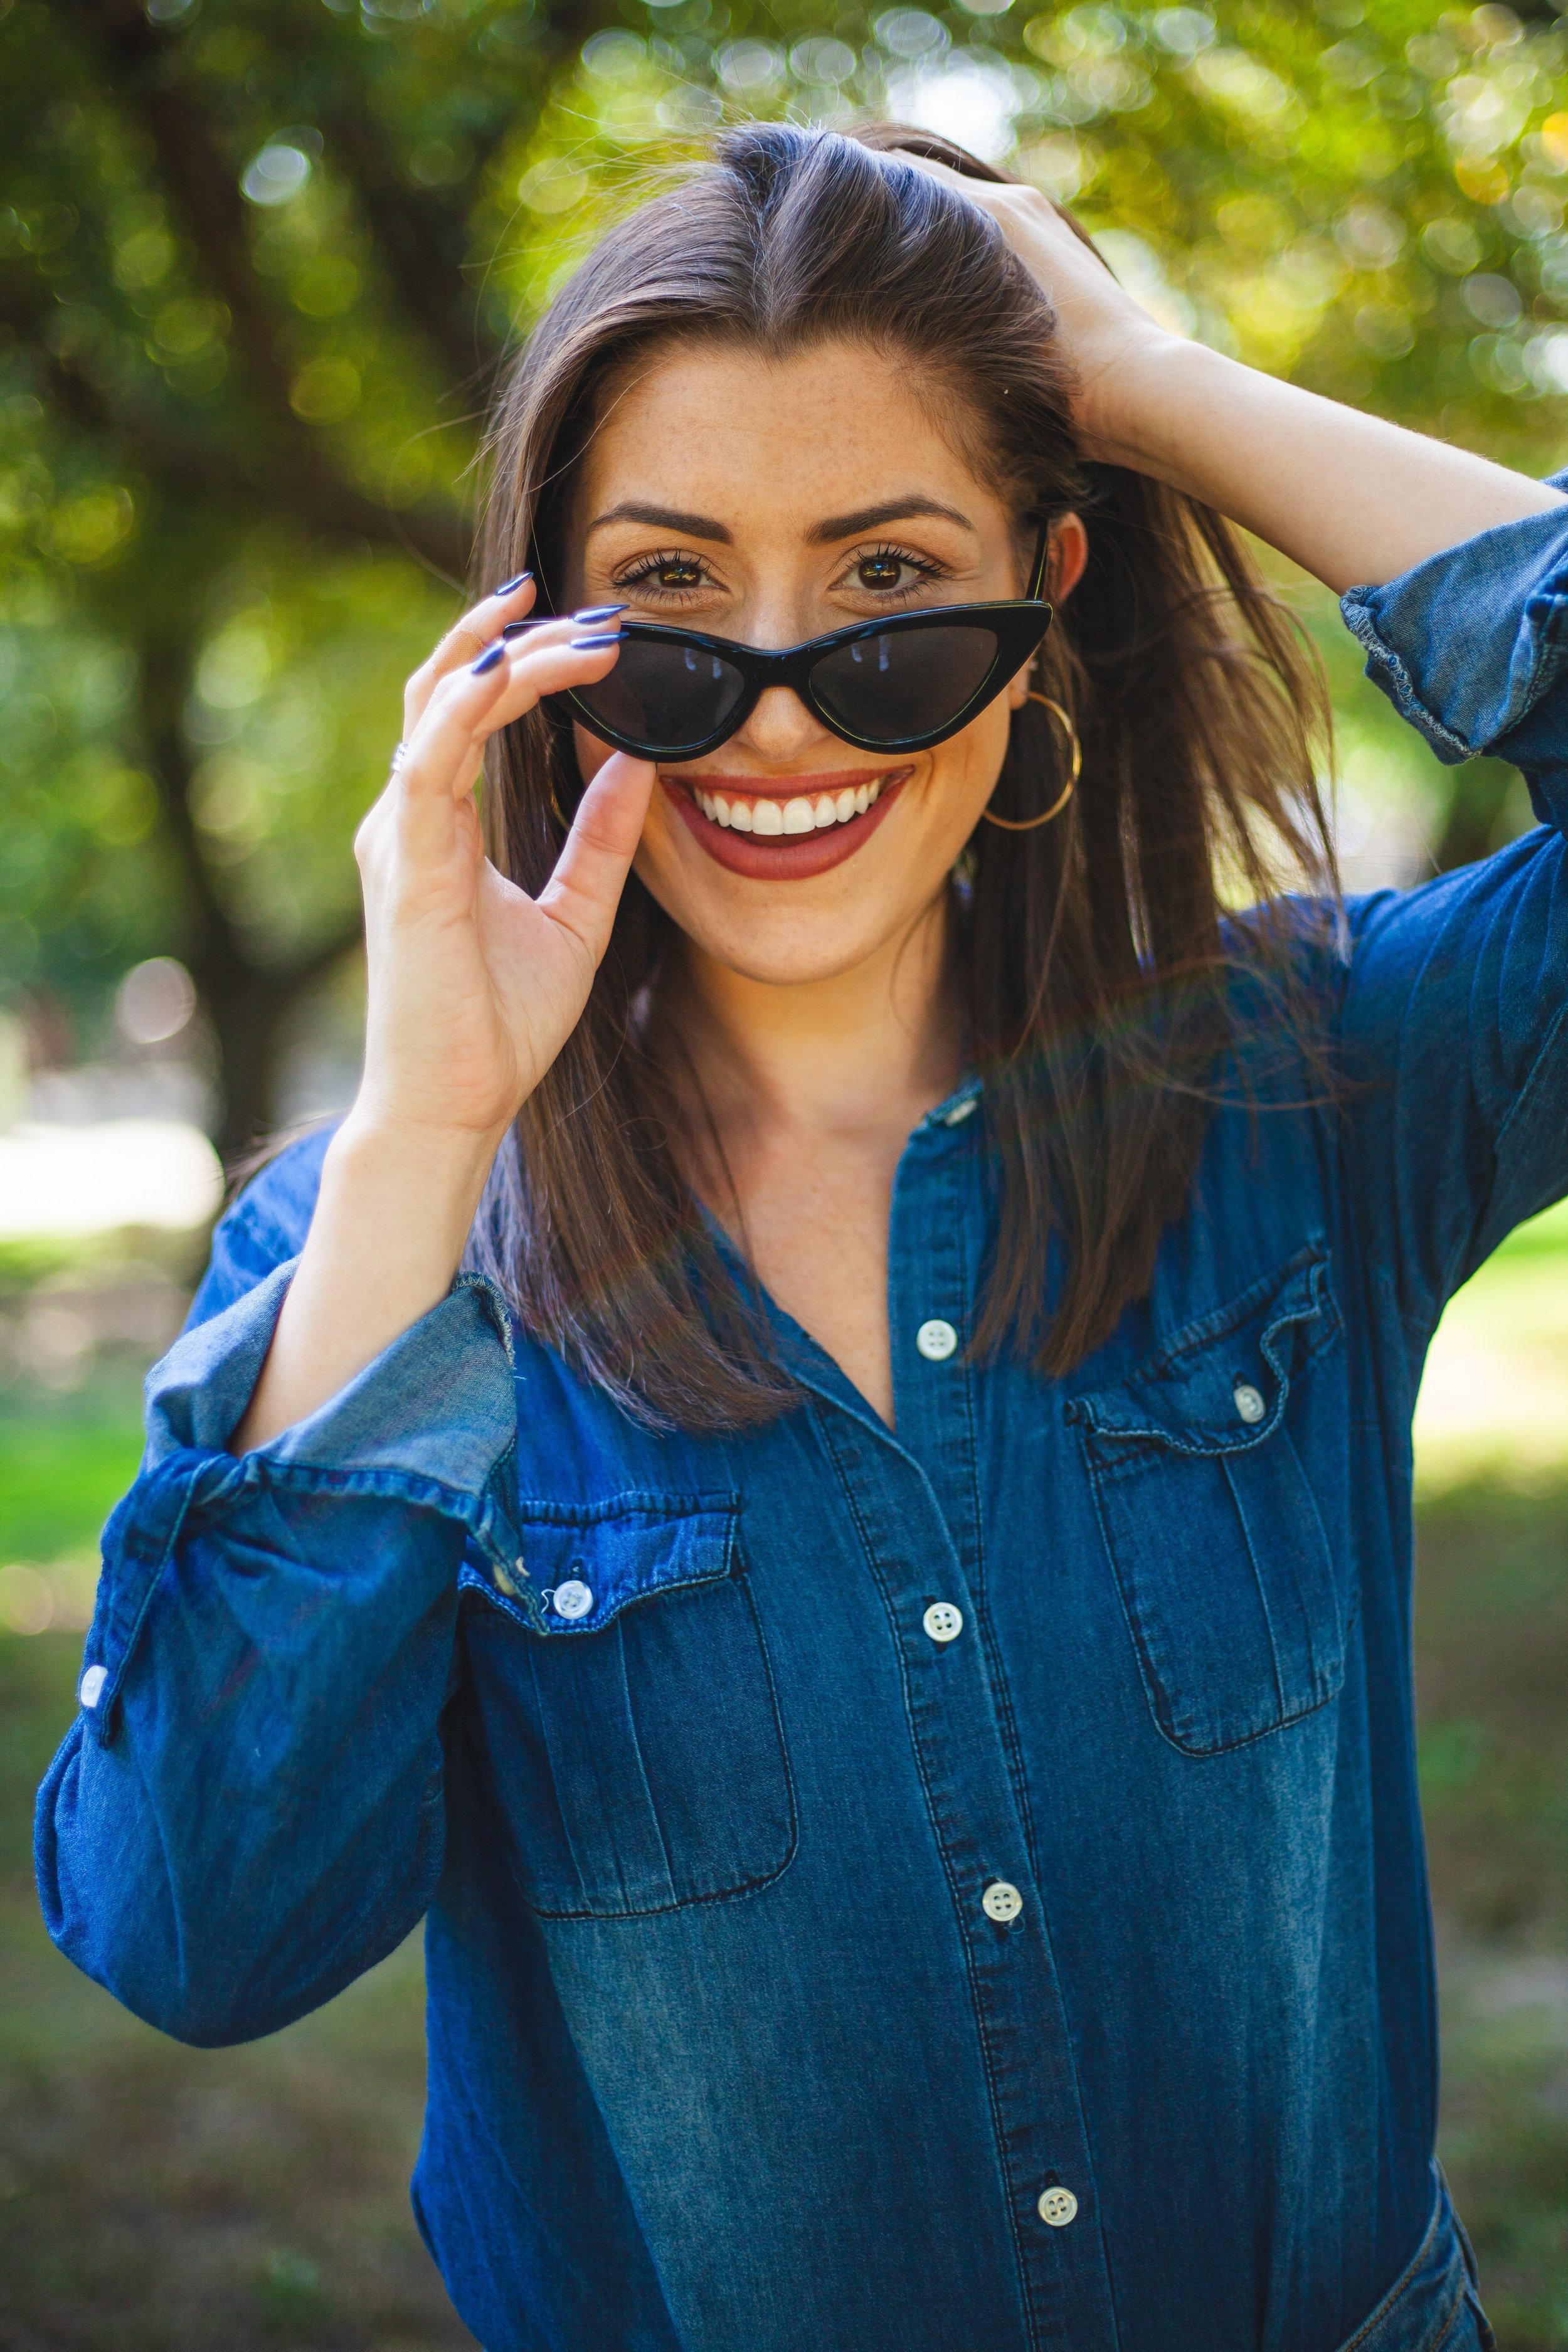 Julia Procaccino Photography @julia_procaccino   SojoS Clout Goggles Cat Eye Sunglasses